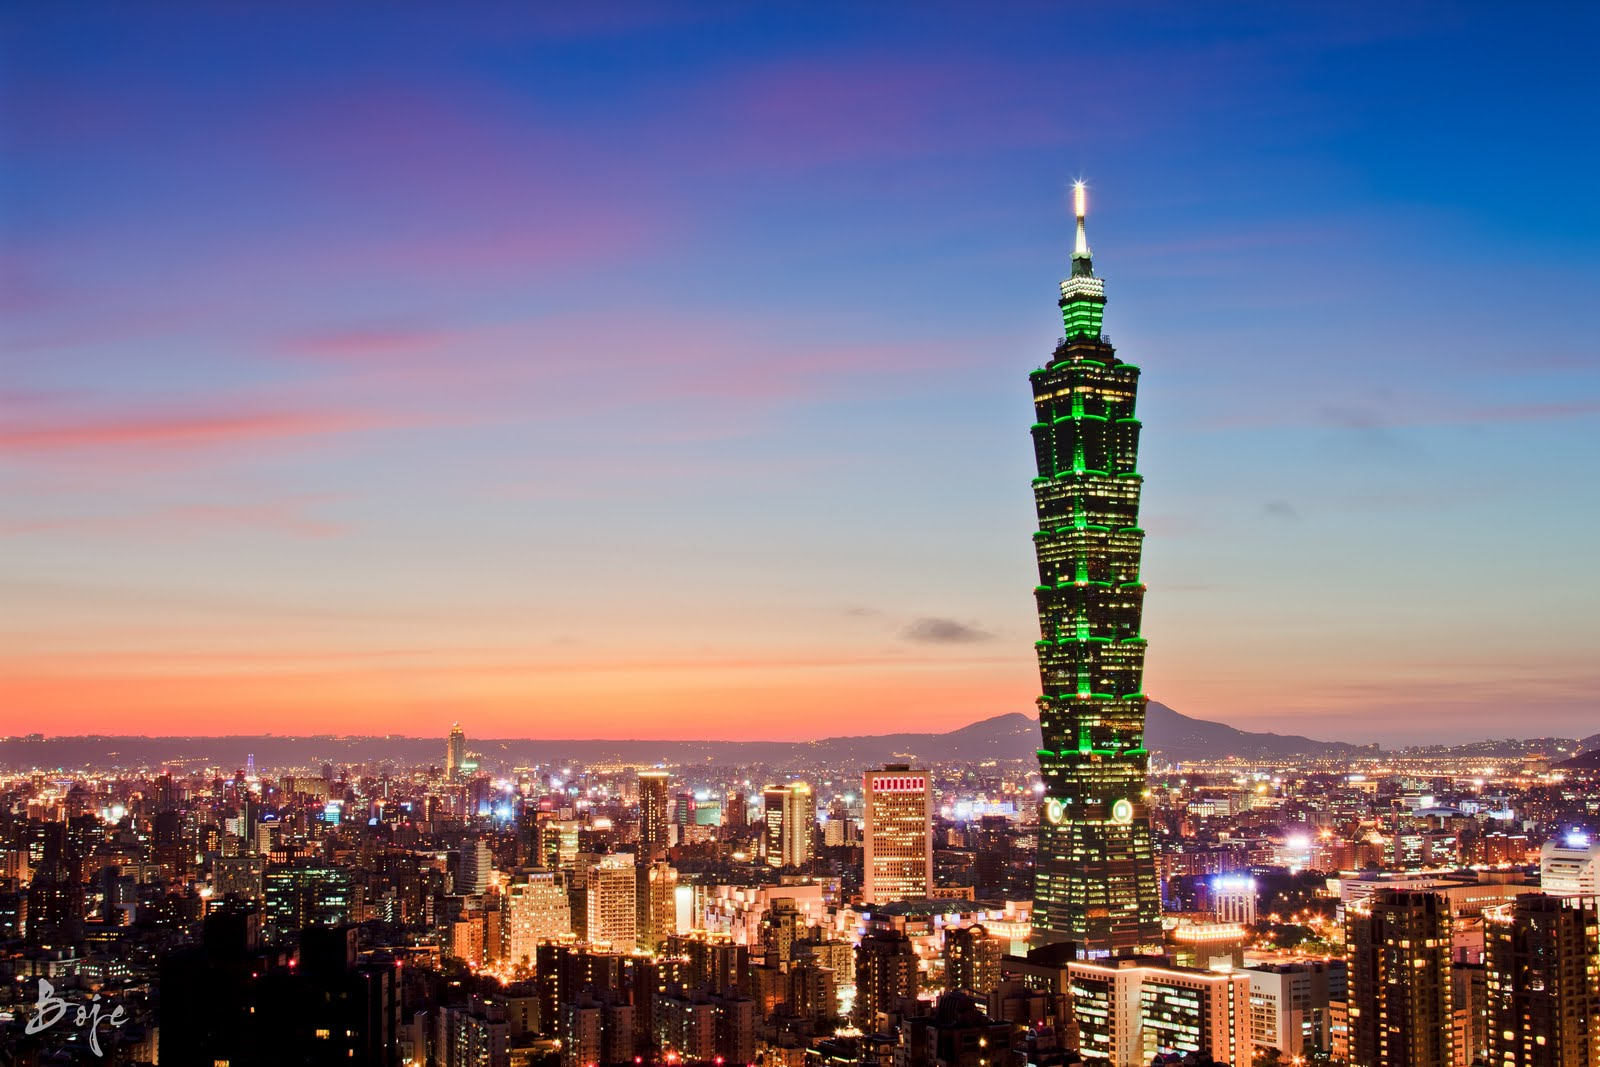 Taipei 101 from Elephant Mountain 1919hoursdd